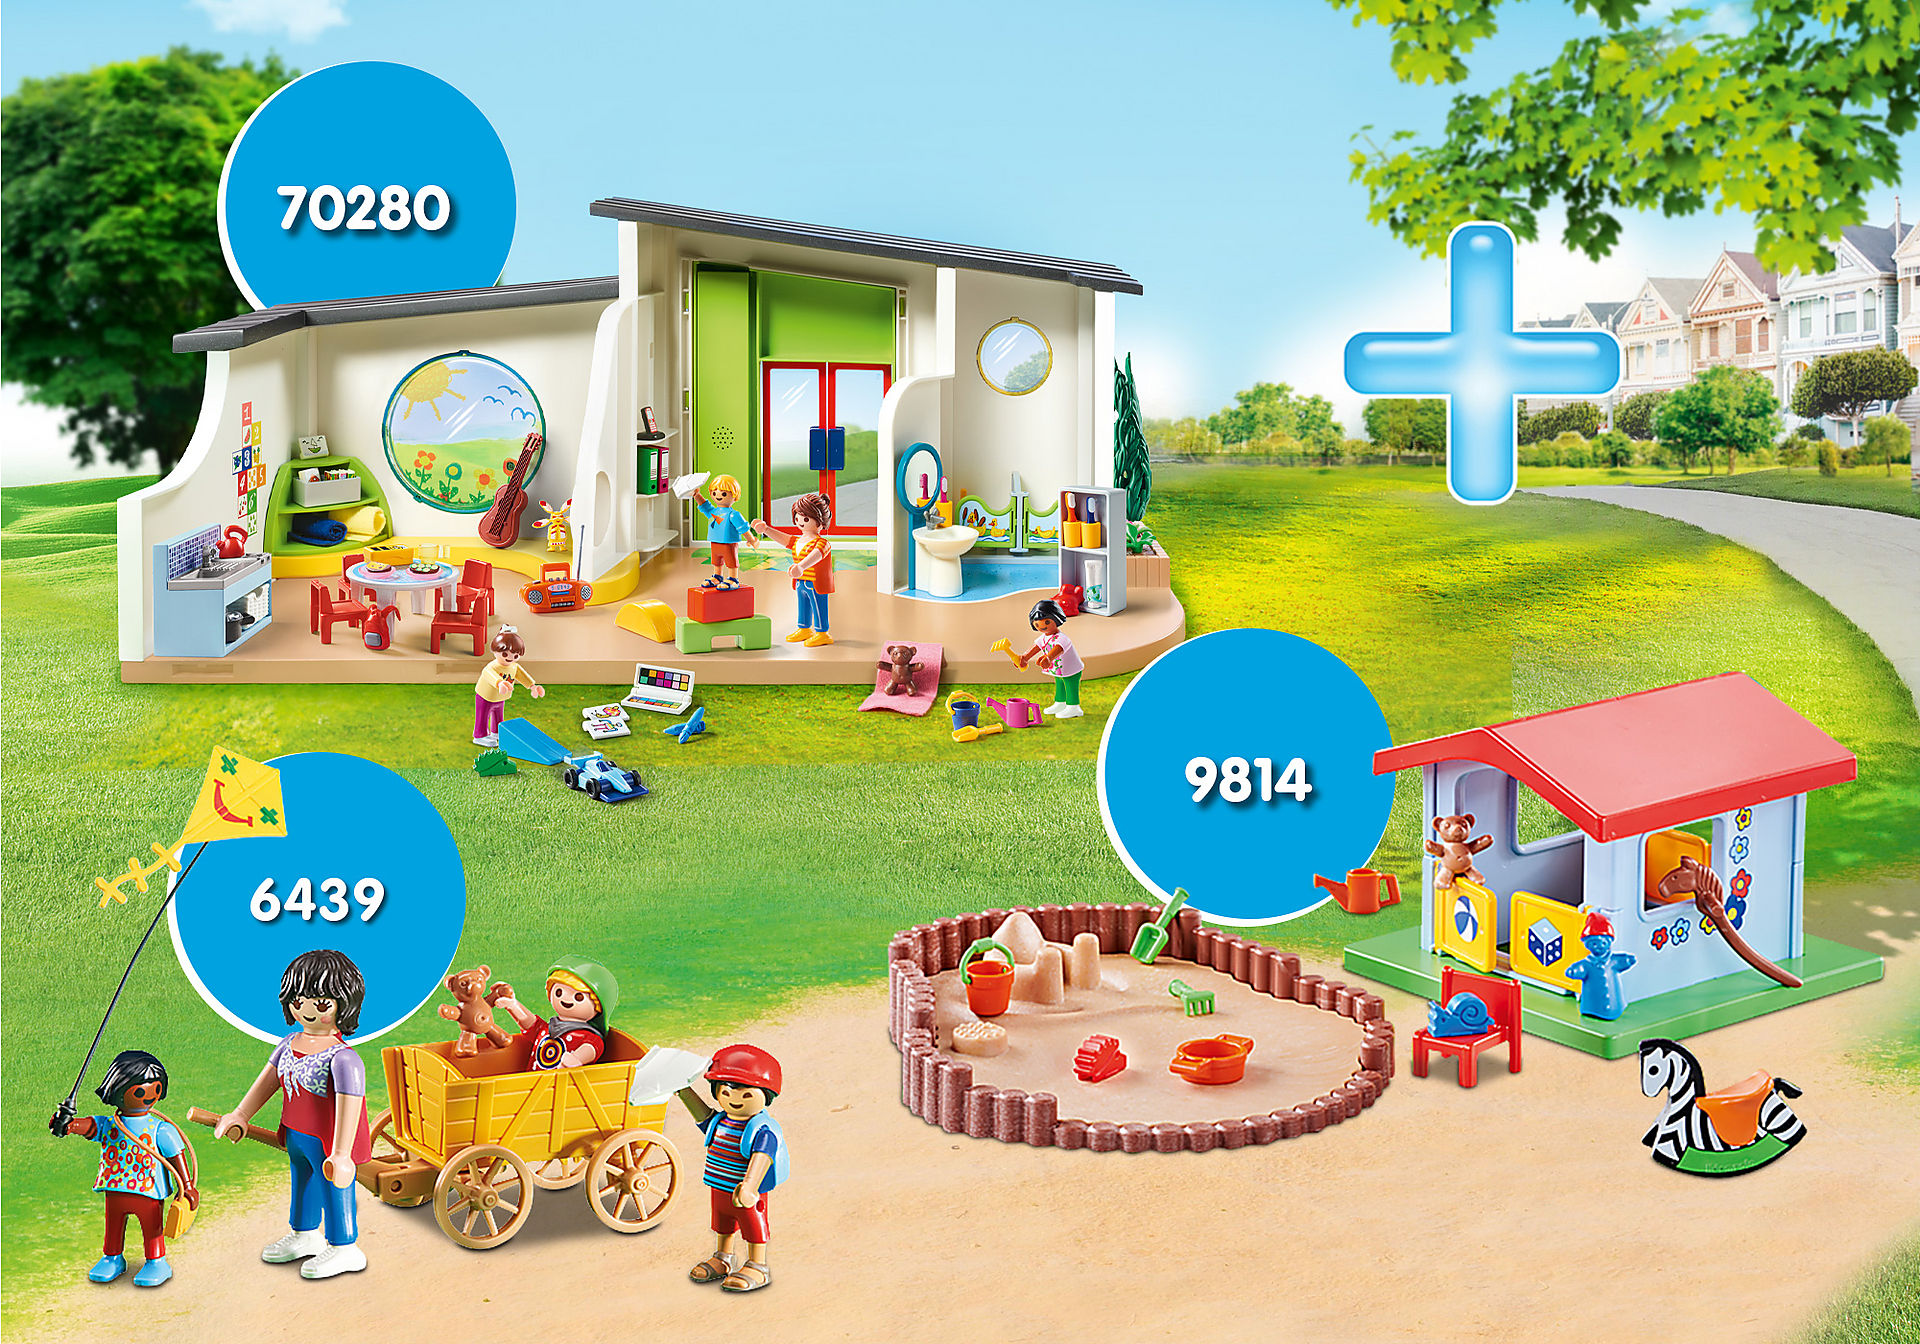 PM2005G Bundel Kinderdagverblijf 'De Regenboog' zoom image1